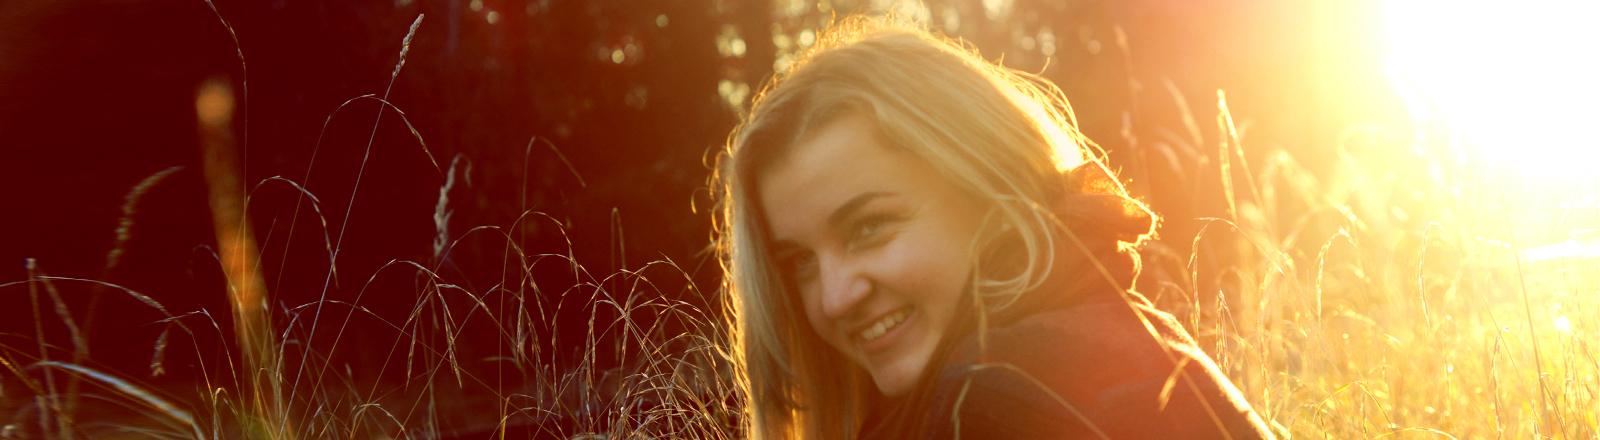 Junge Frau tankt Herbstsonne